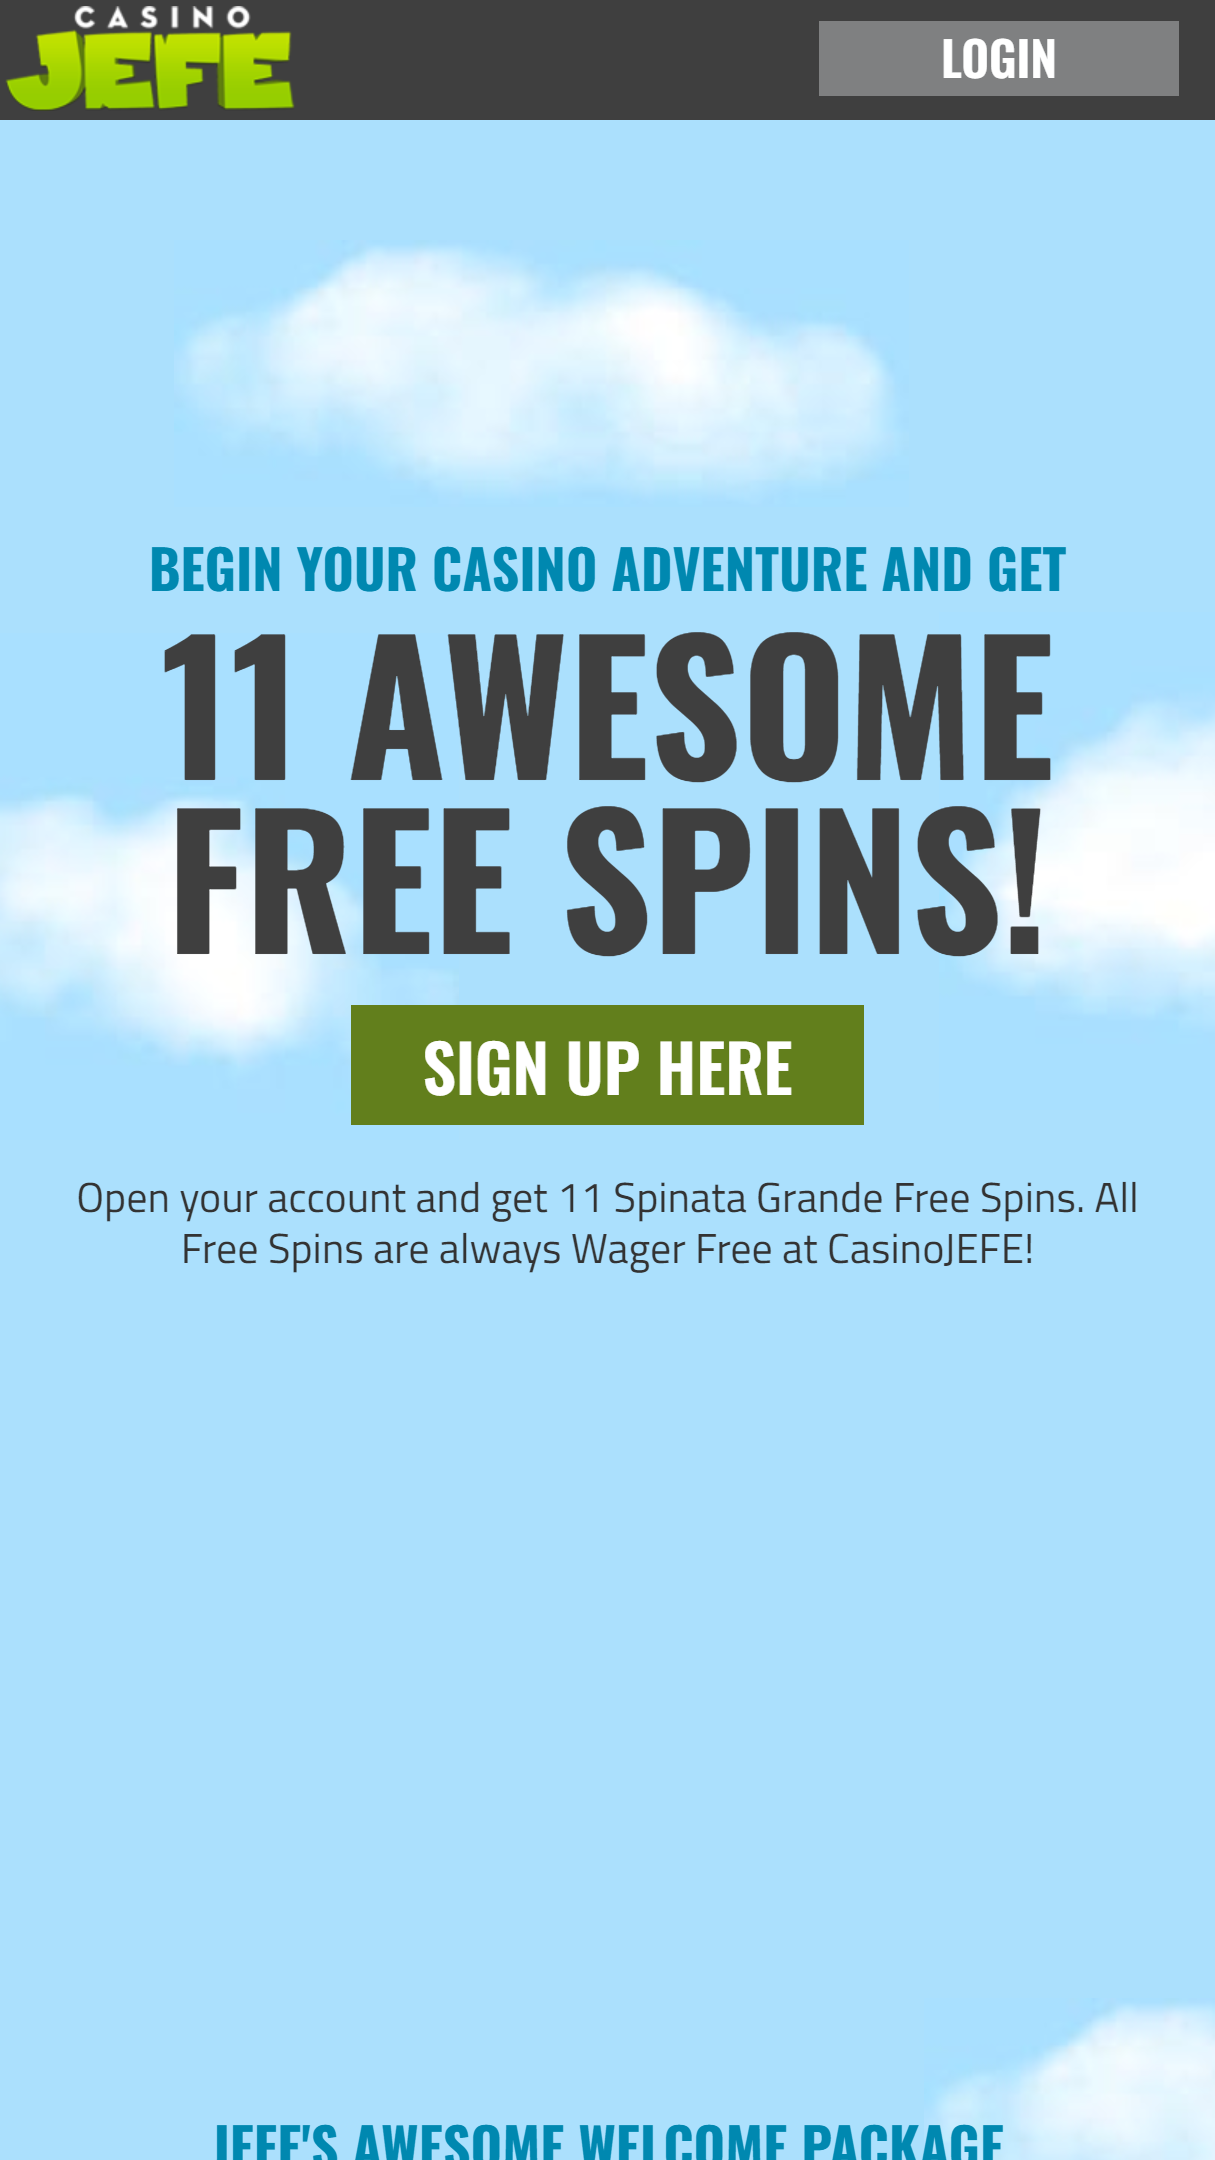 Casino Jefe App Homepage